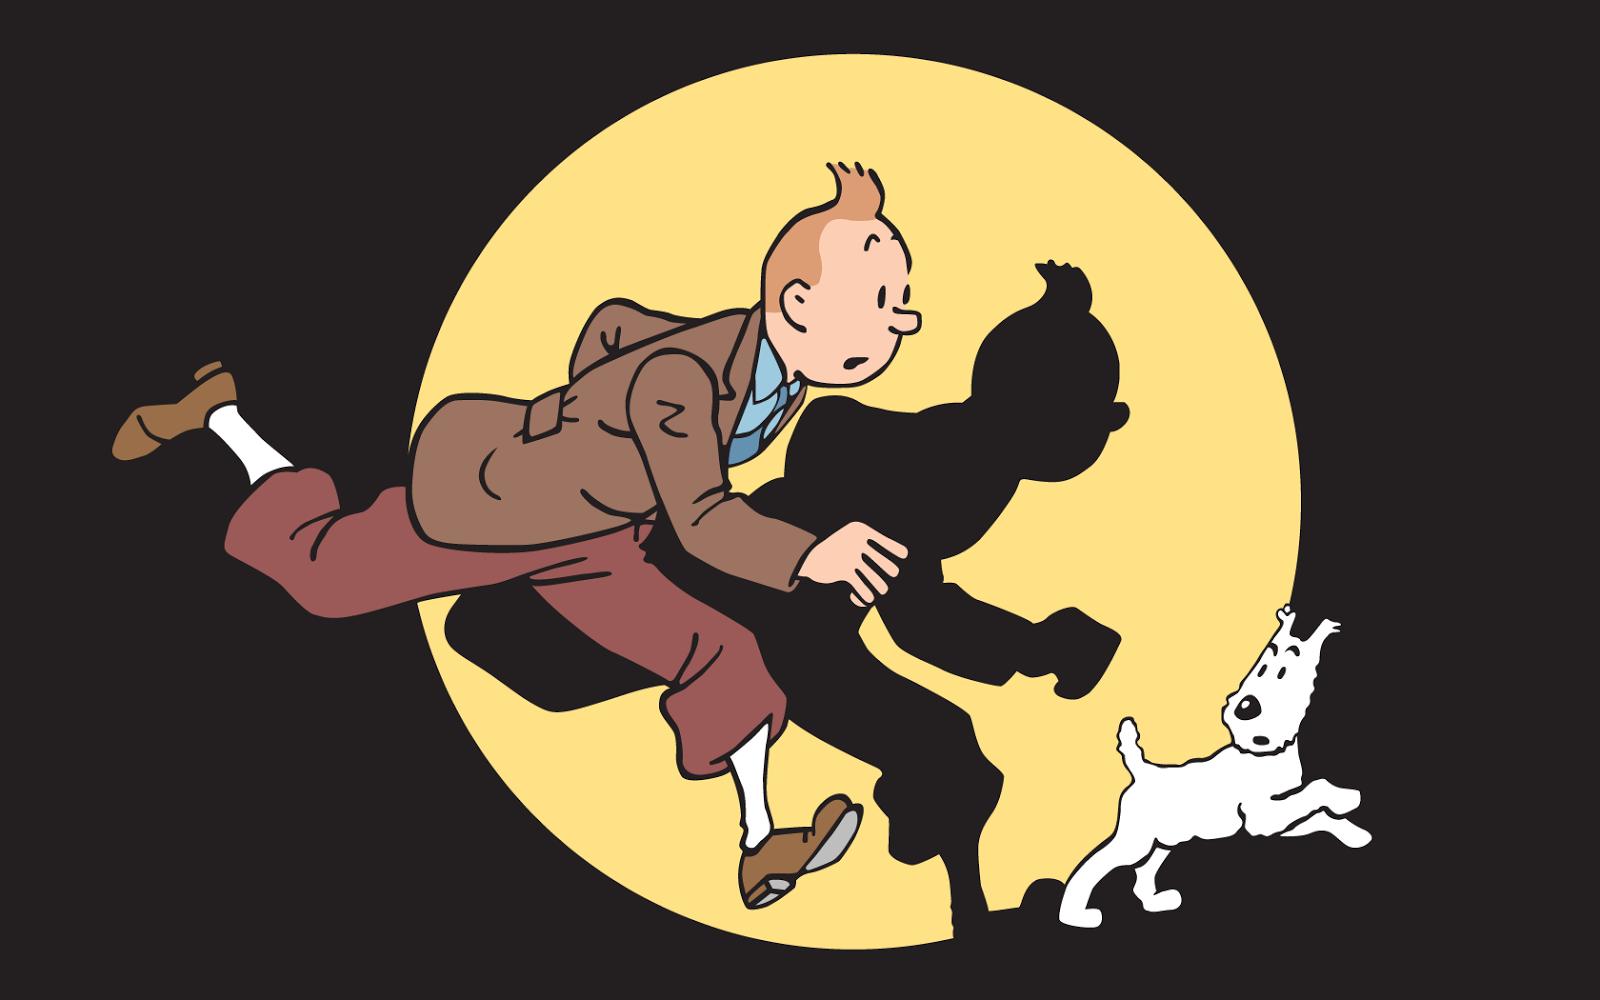 Lima Kasus Kontroversi Dibalik Lucunya Serial Kartun Terkenal